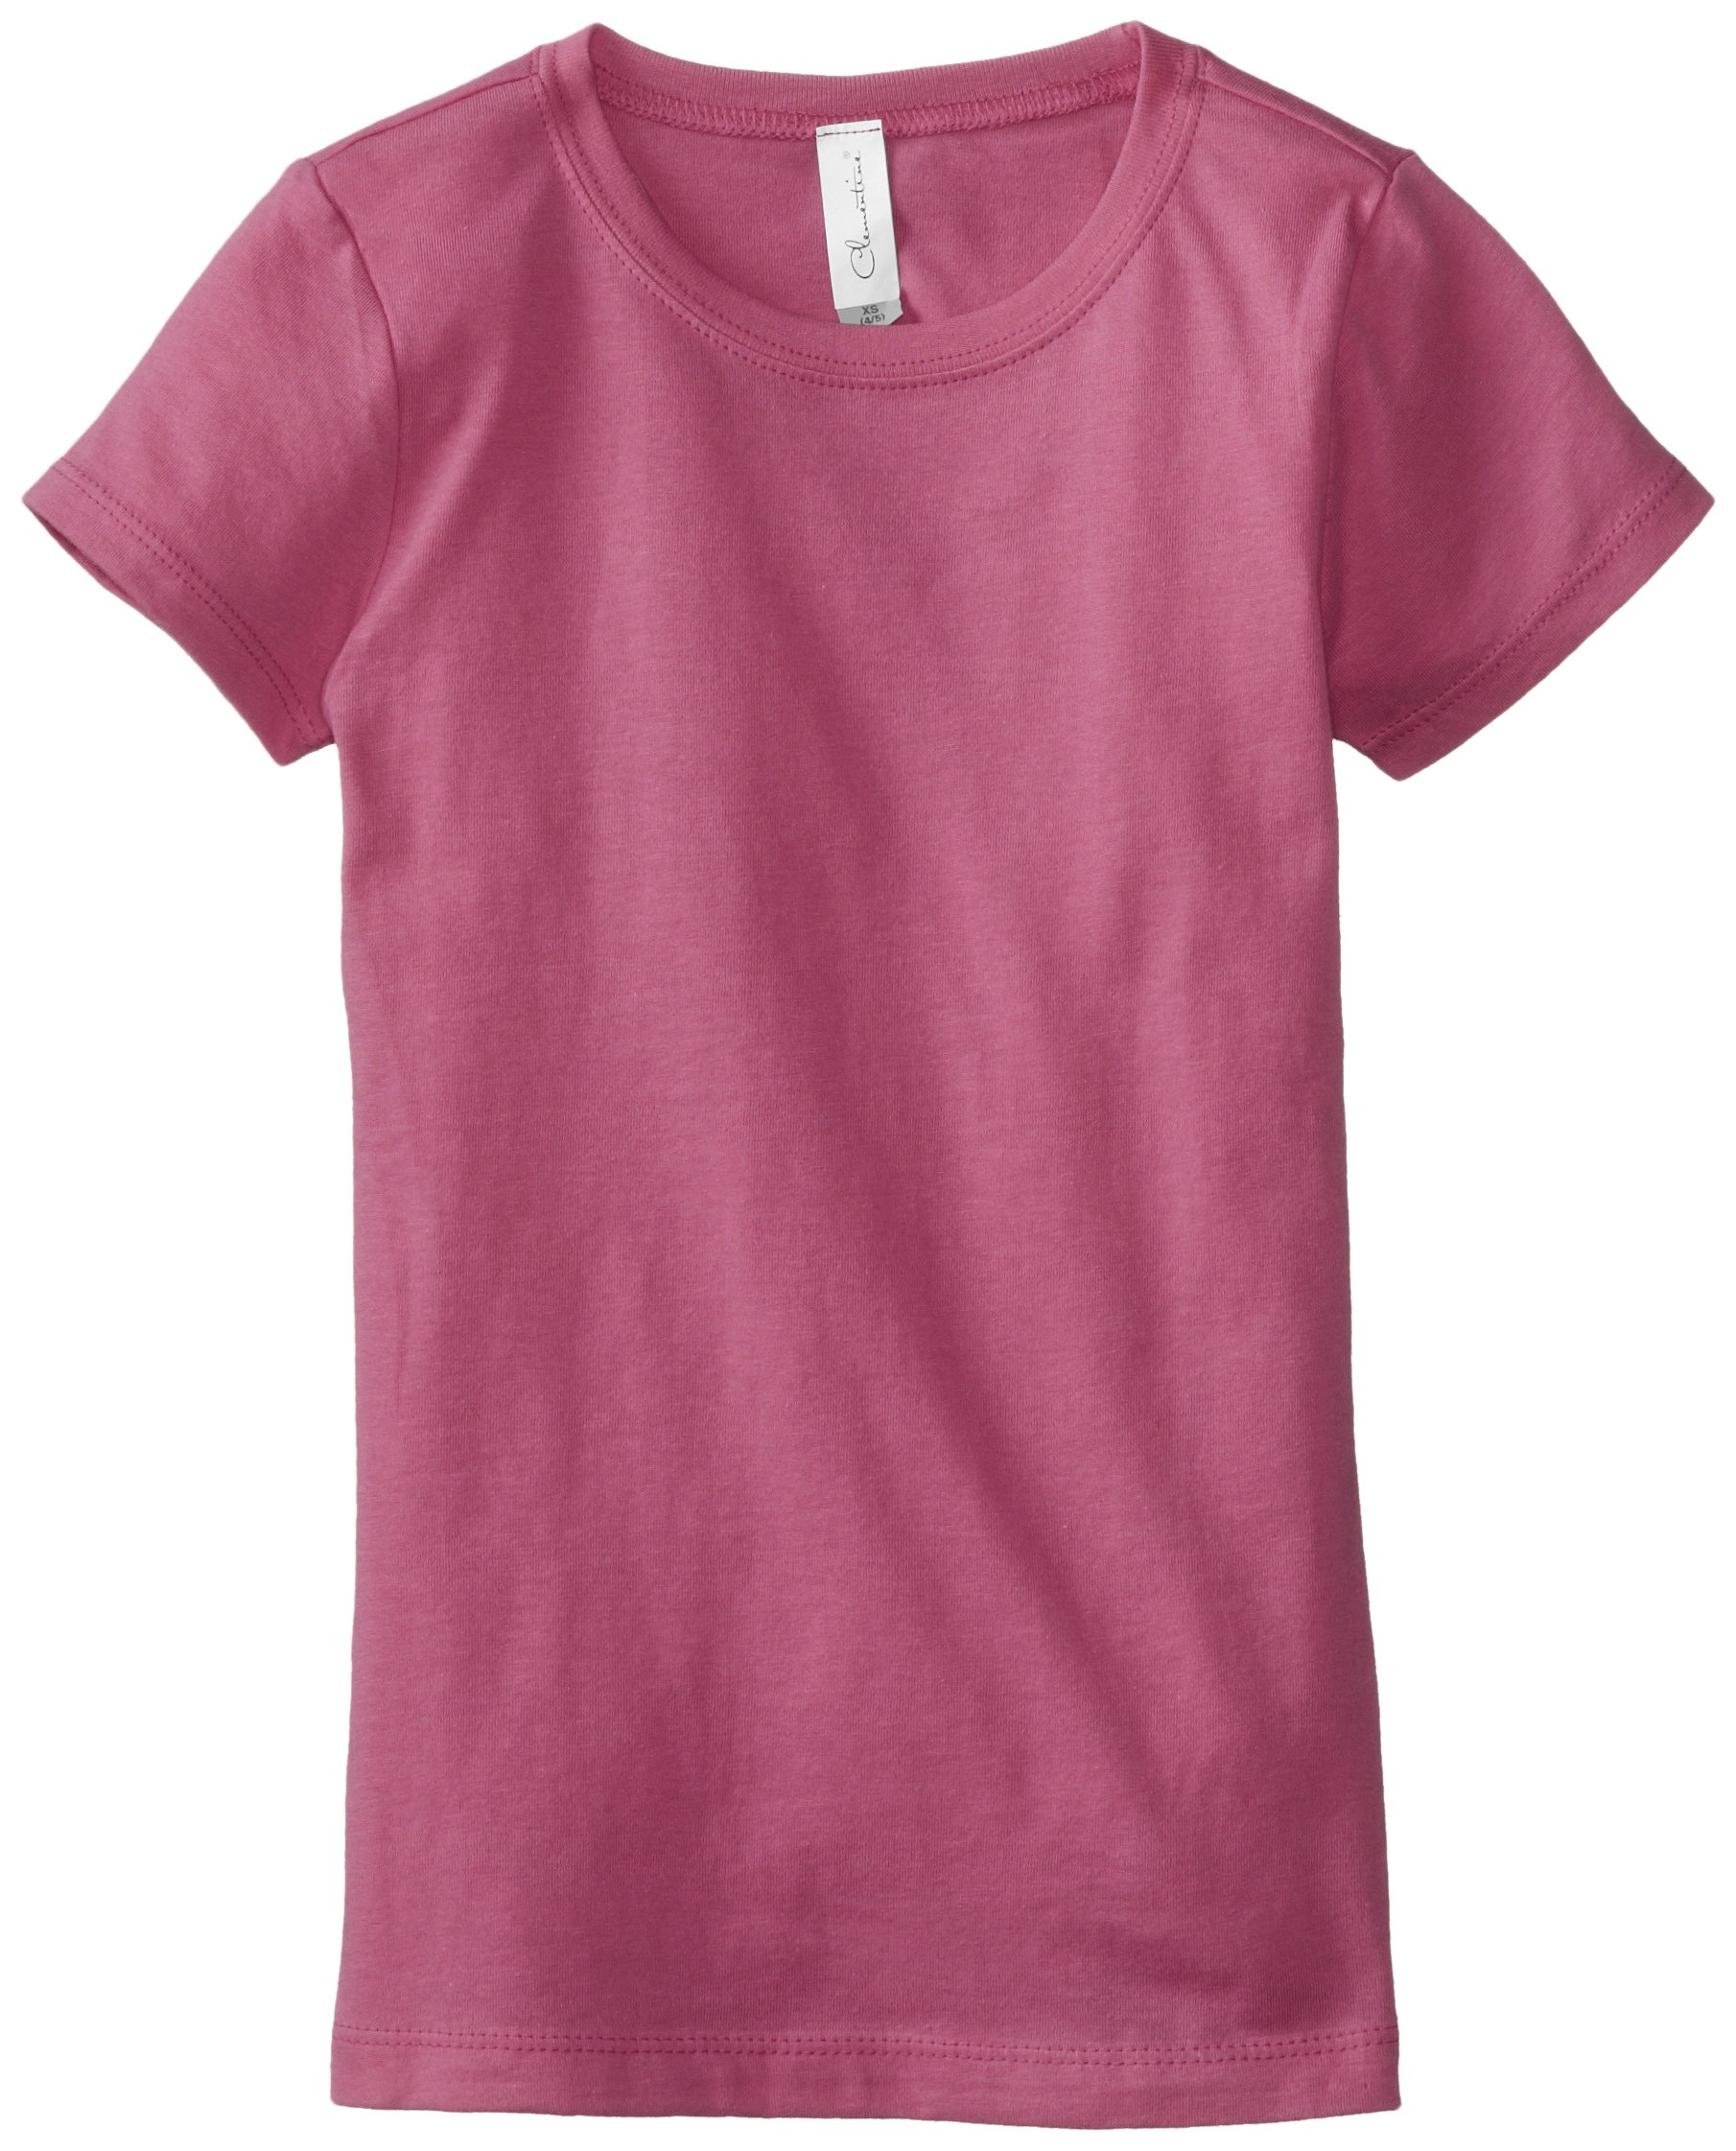 Clementine Big Girls' Everyday T-Shirt, Raspberry, Large(10-12)